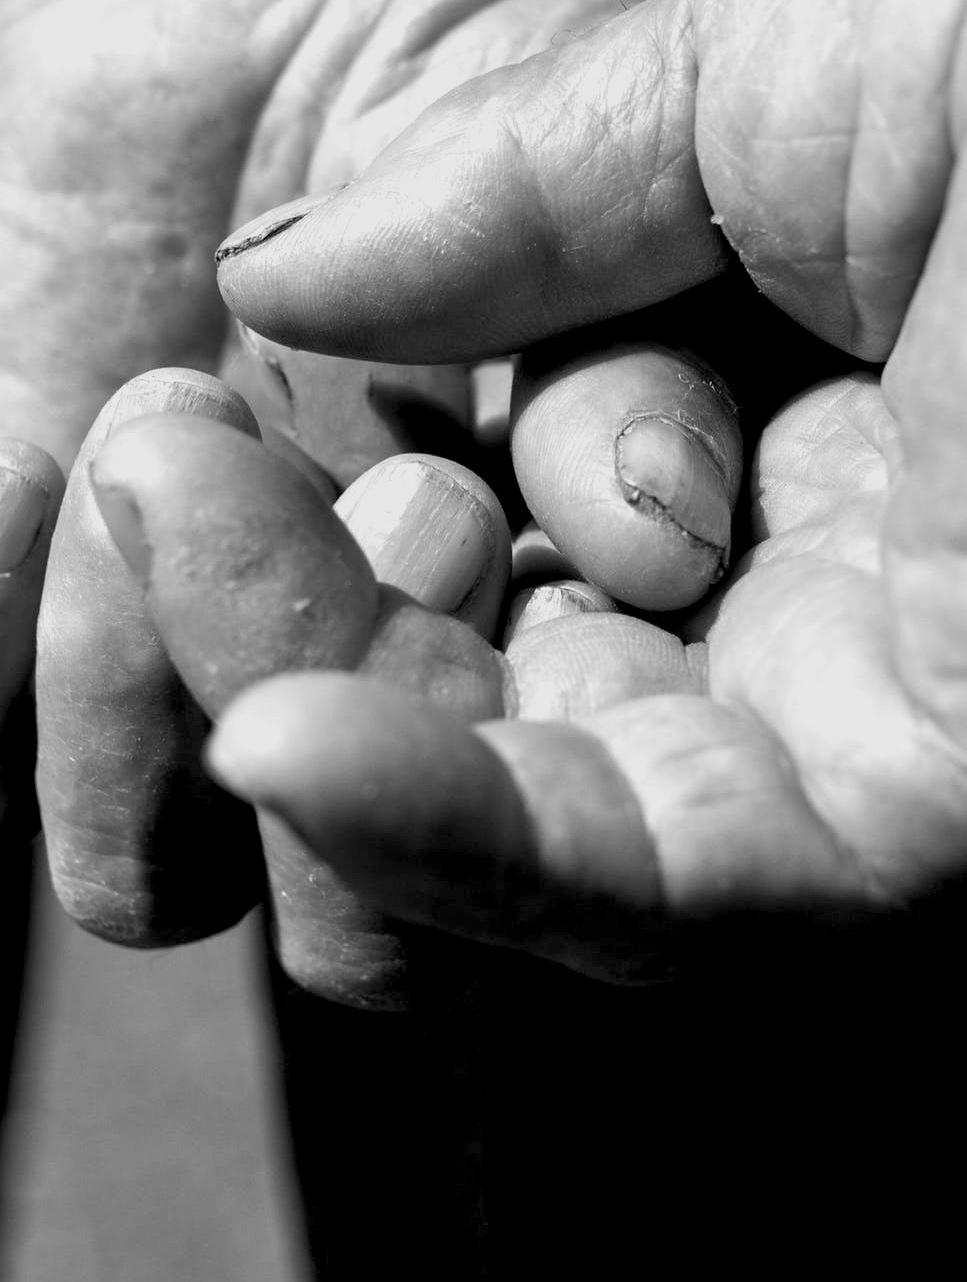 alberto lacet matureia velhice envelhecer ze crispim ambiente de leitura carlos romero poesia paraibana